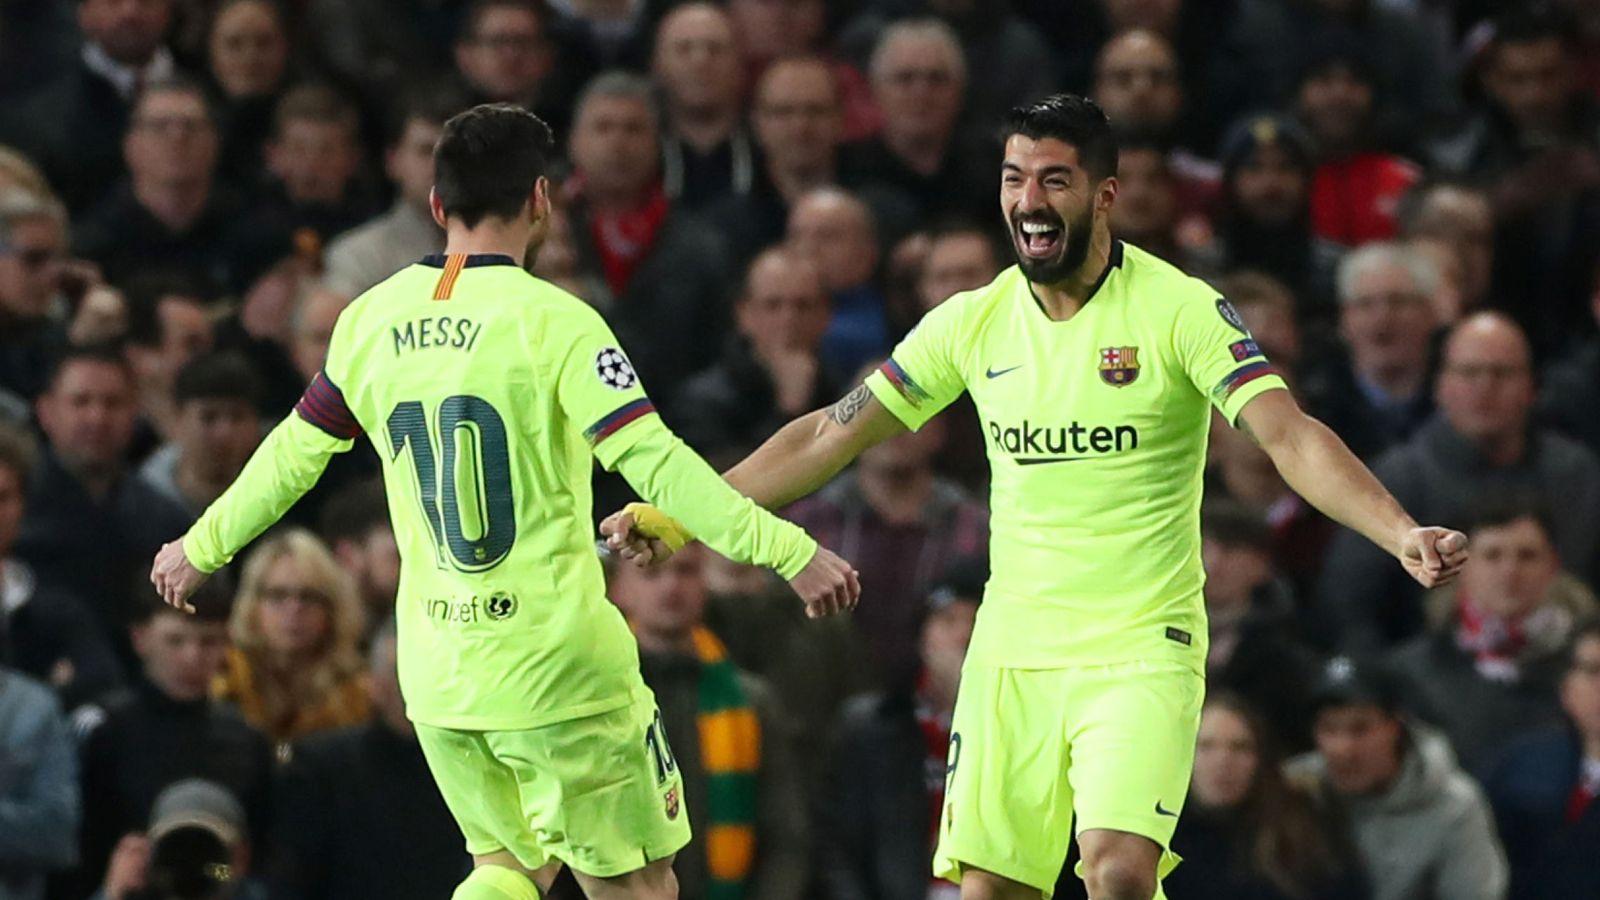 Foto: Champions league quarter final first leg - manchester united v fc barcelona